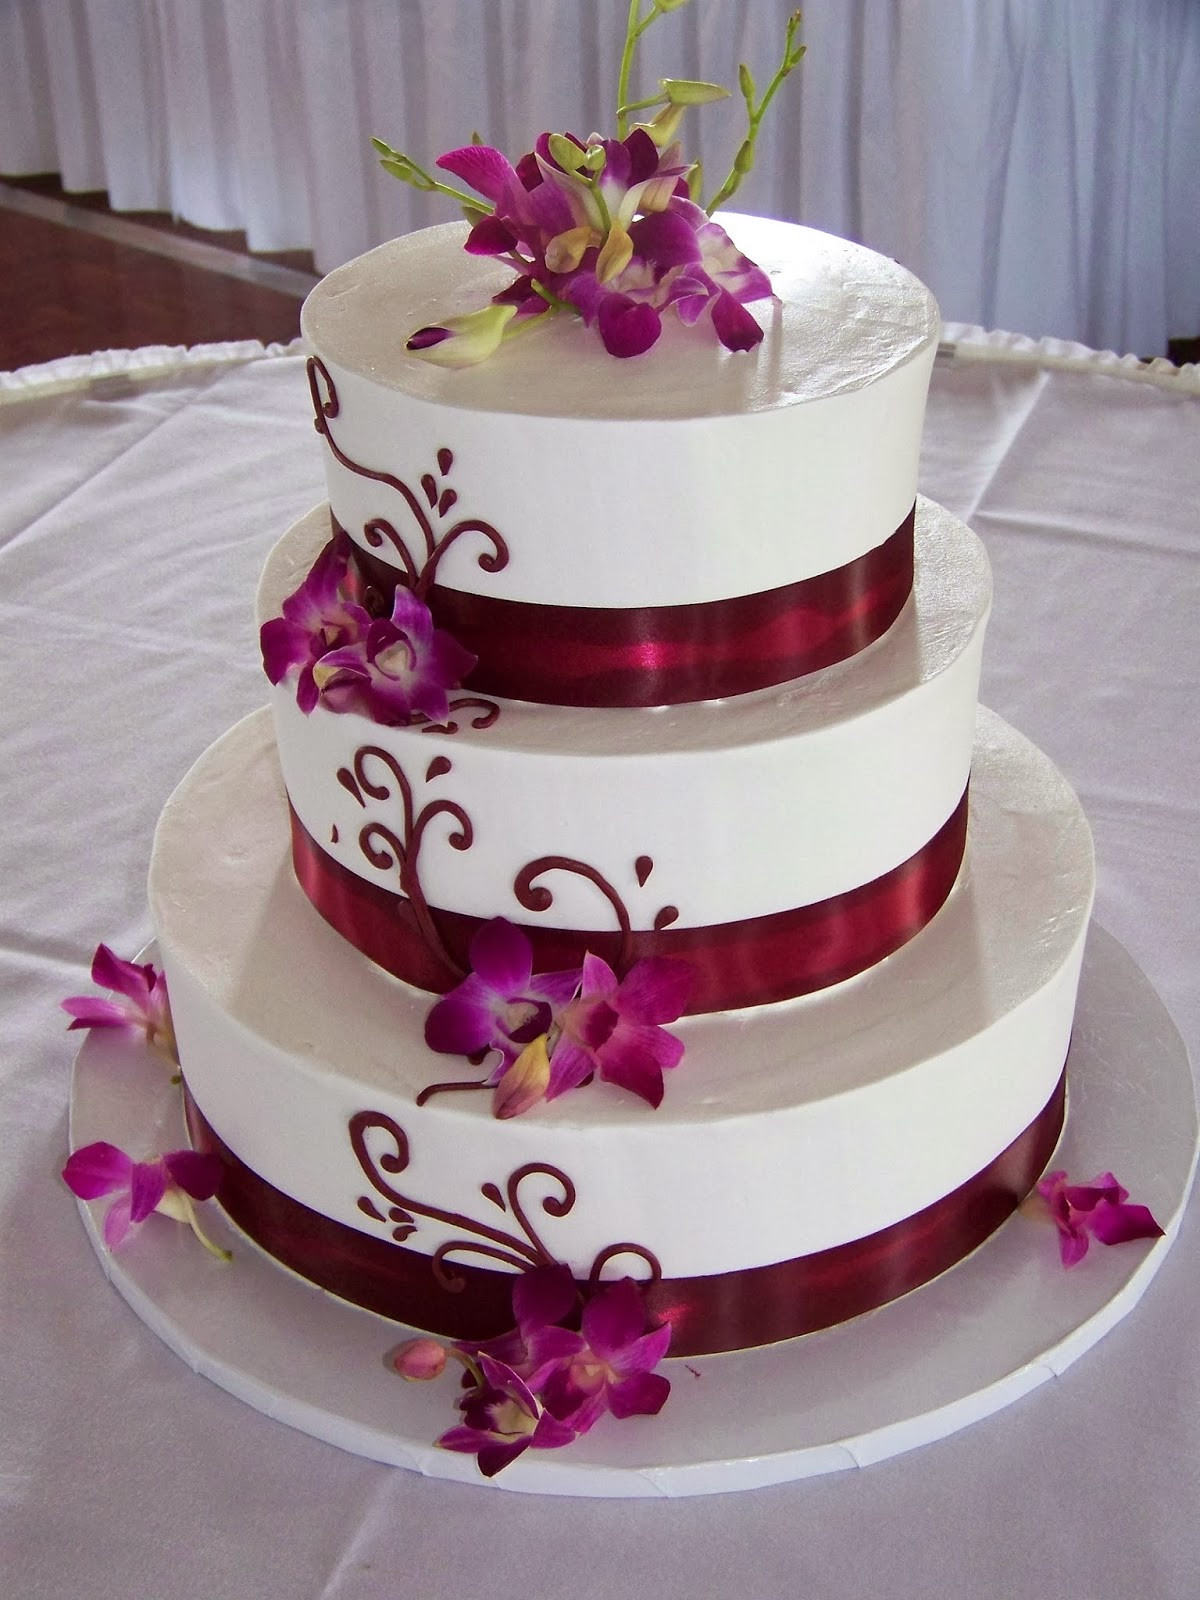 Wedding Cakes Galleries  7 wonders of the world Wedding Cake Hd Gallery